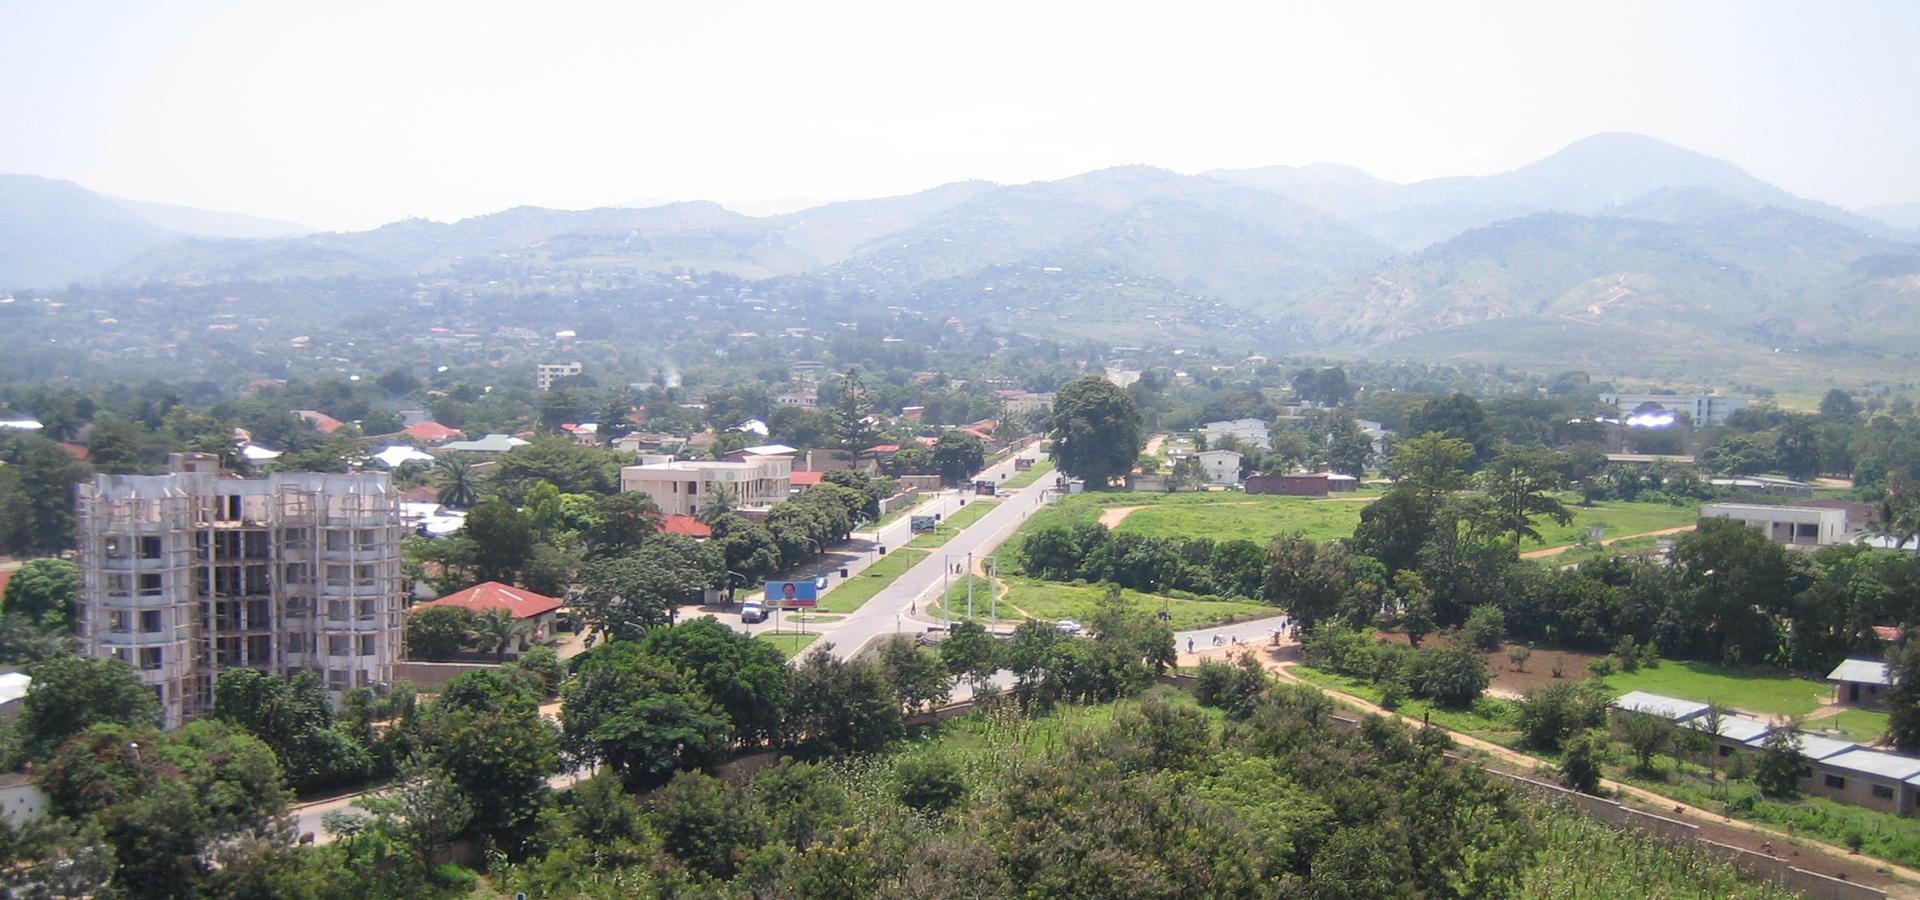 Peer-to-peer advisory in Bujumbura, Burundi.